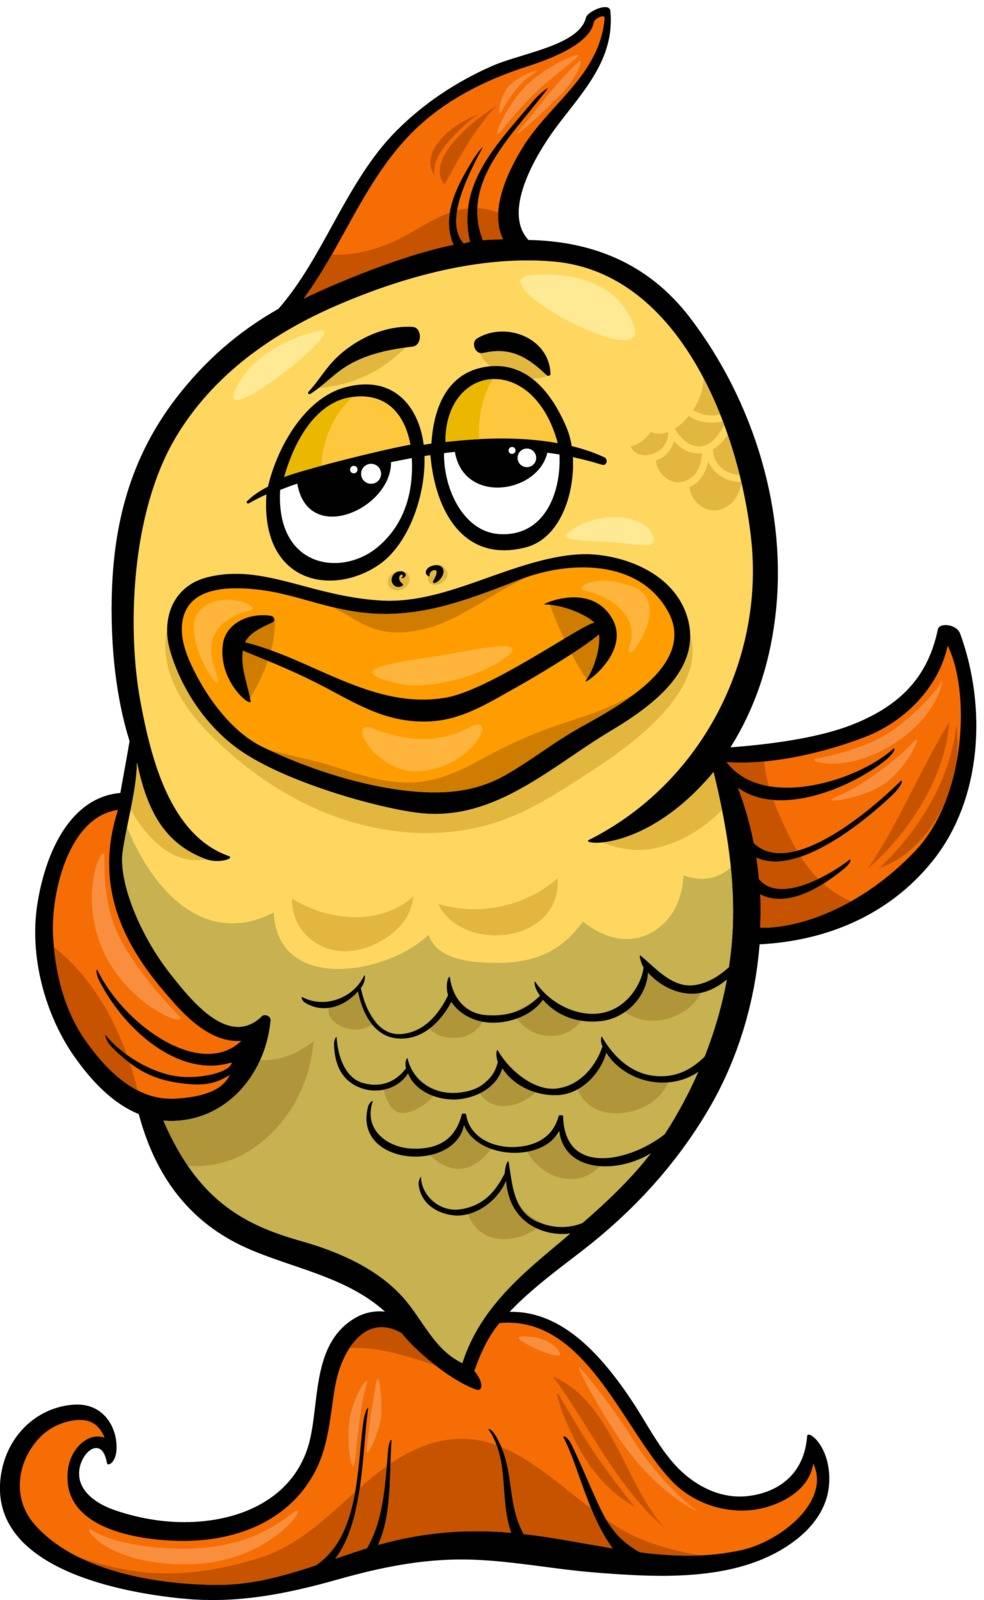 Cartoon Illustration of Funny Gold Fish Character